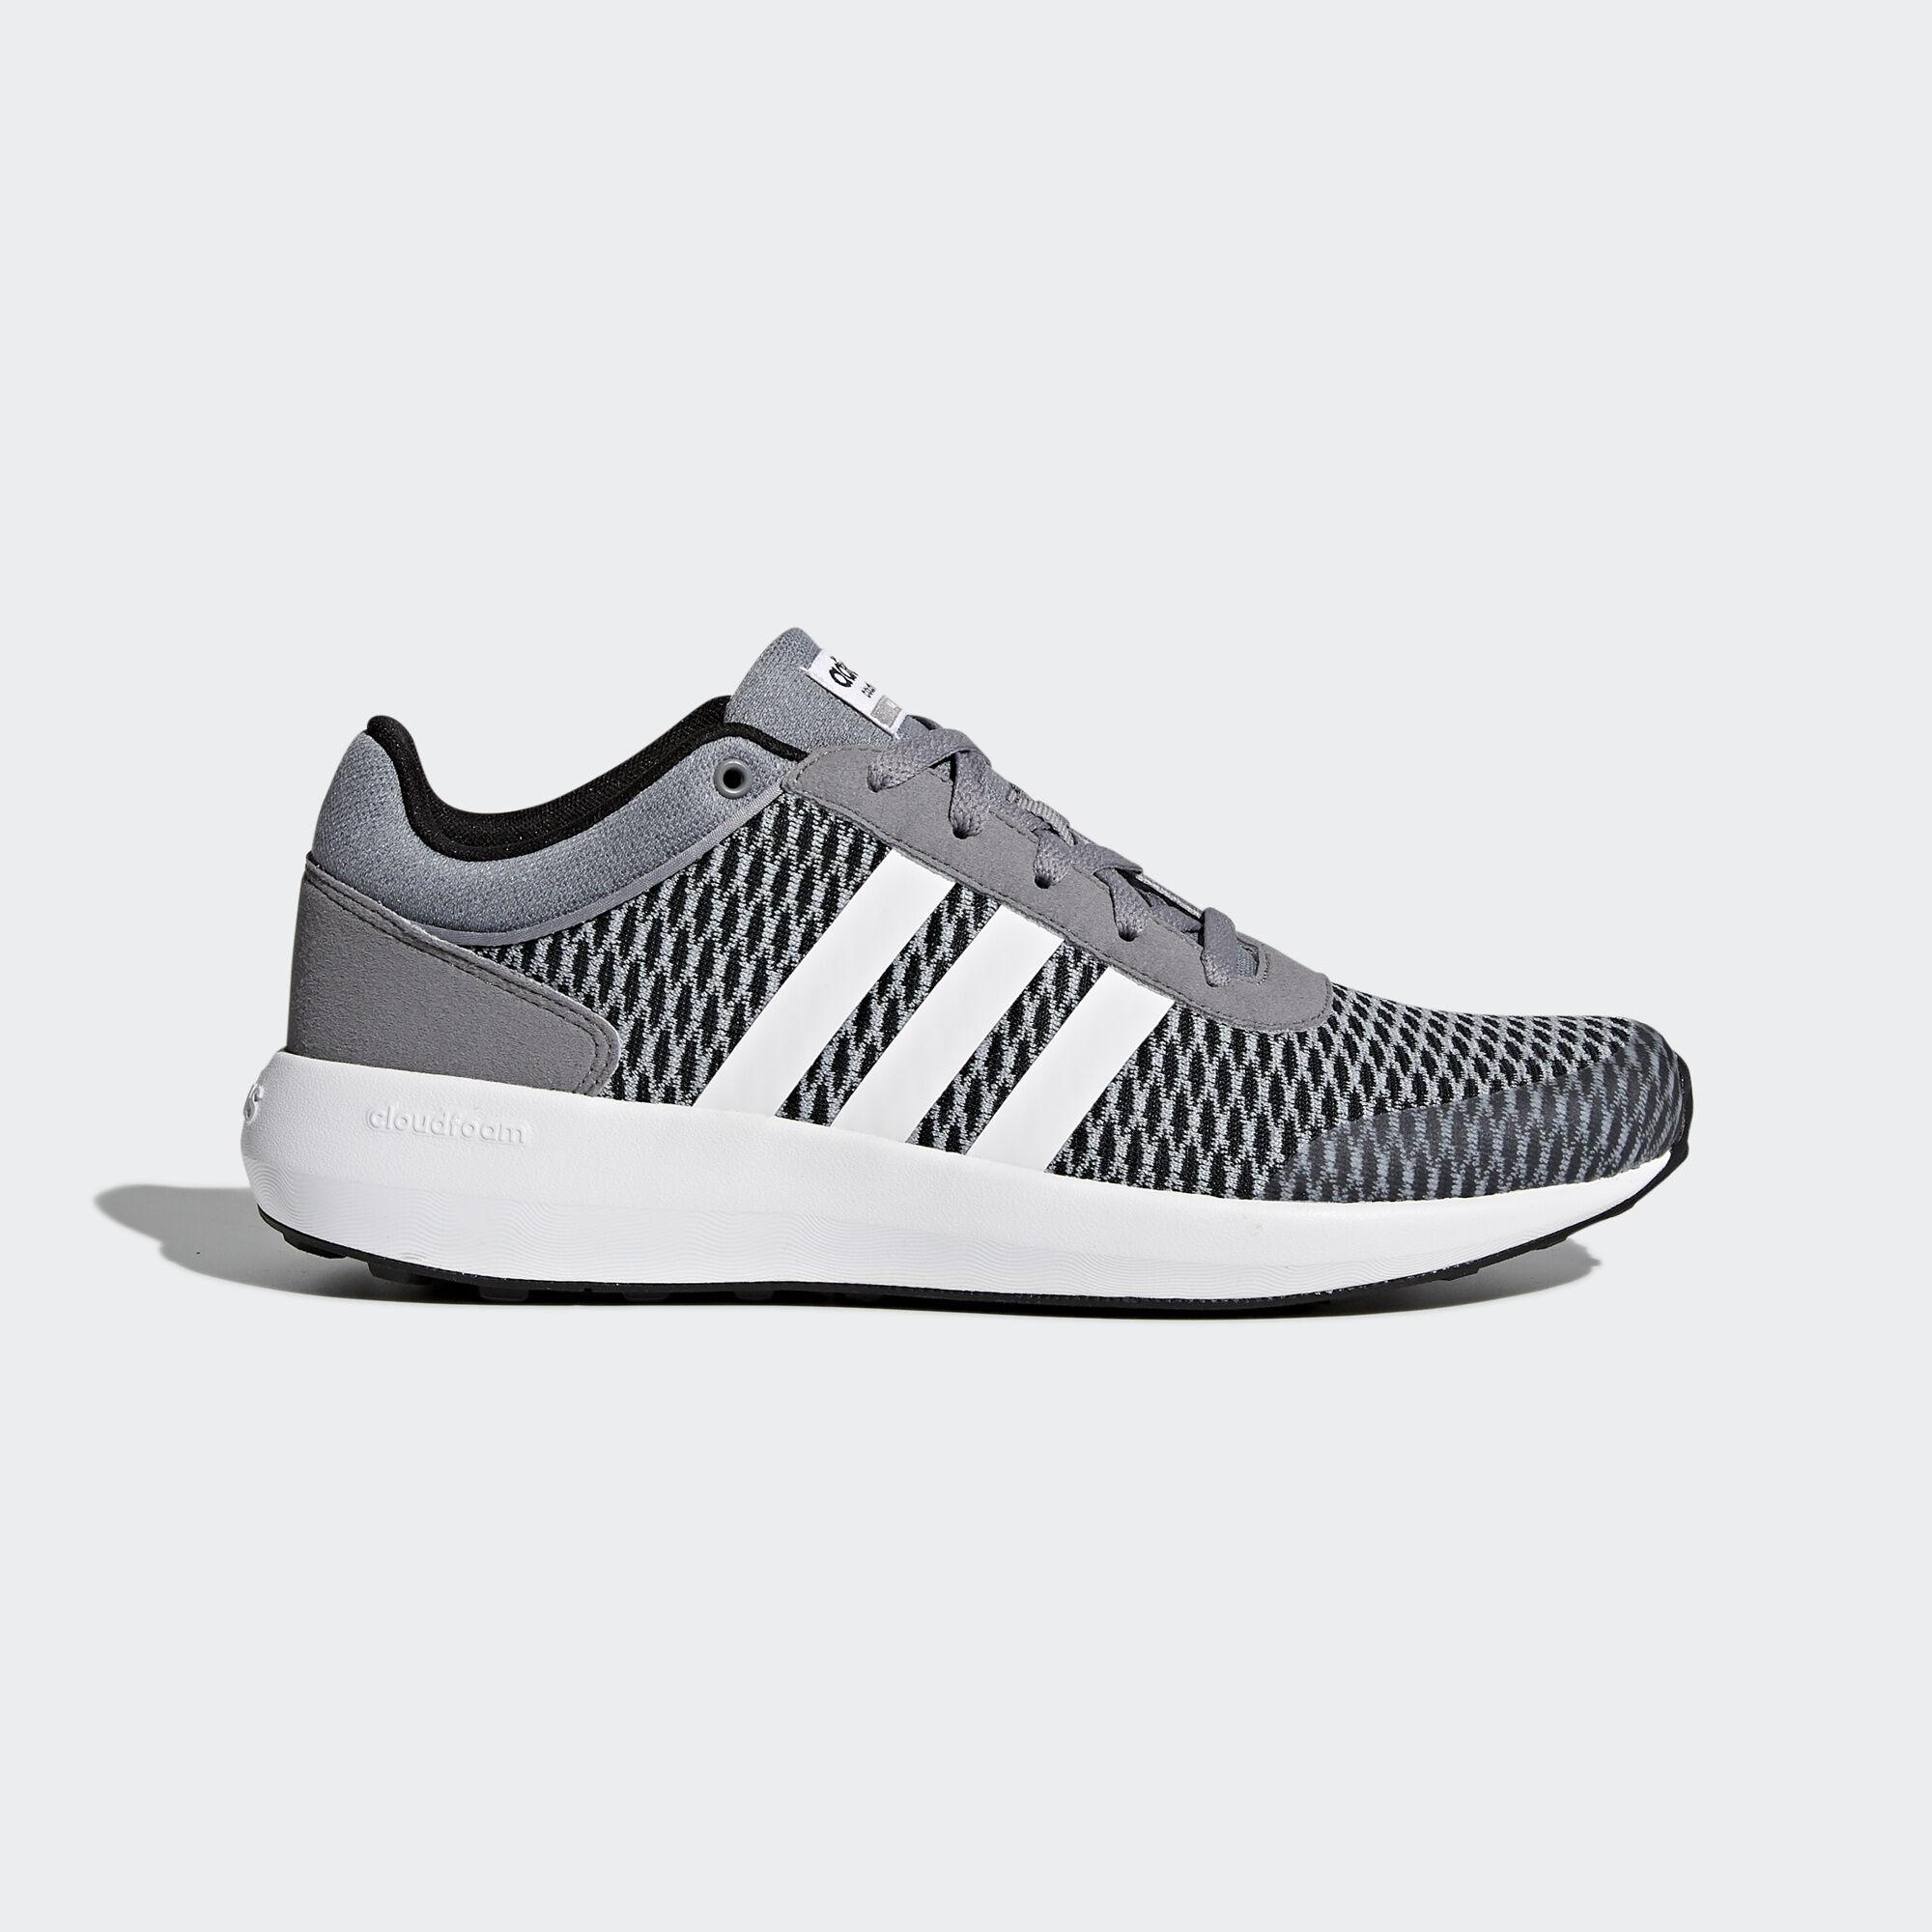 adidas - Cloudfoam Race Shoes Core Black / Running White / Grey AW5327